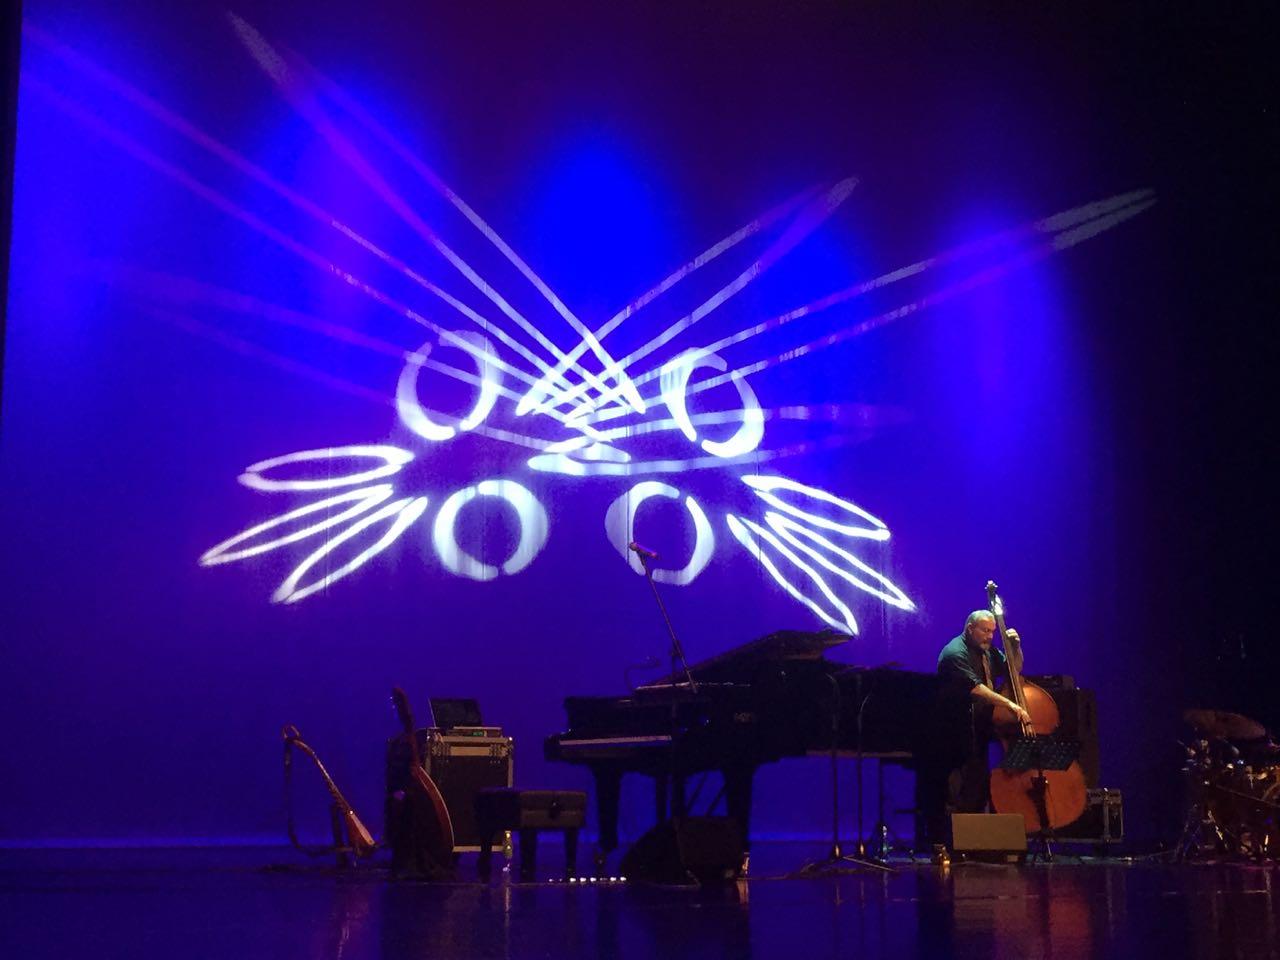 Bass solo, Huai'an, China September 20, 2016